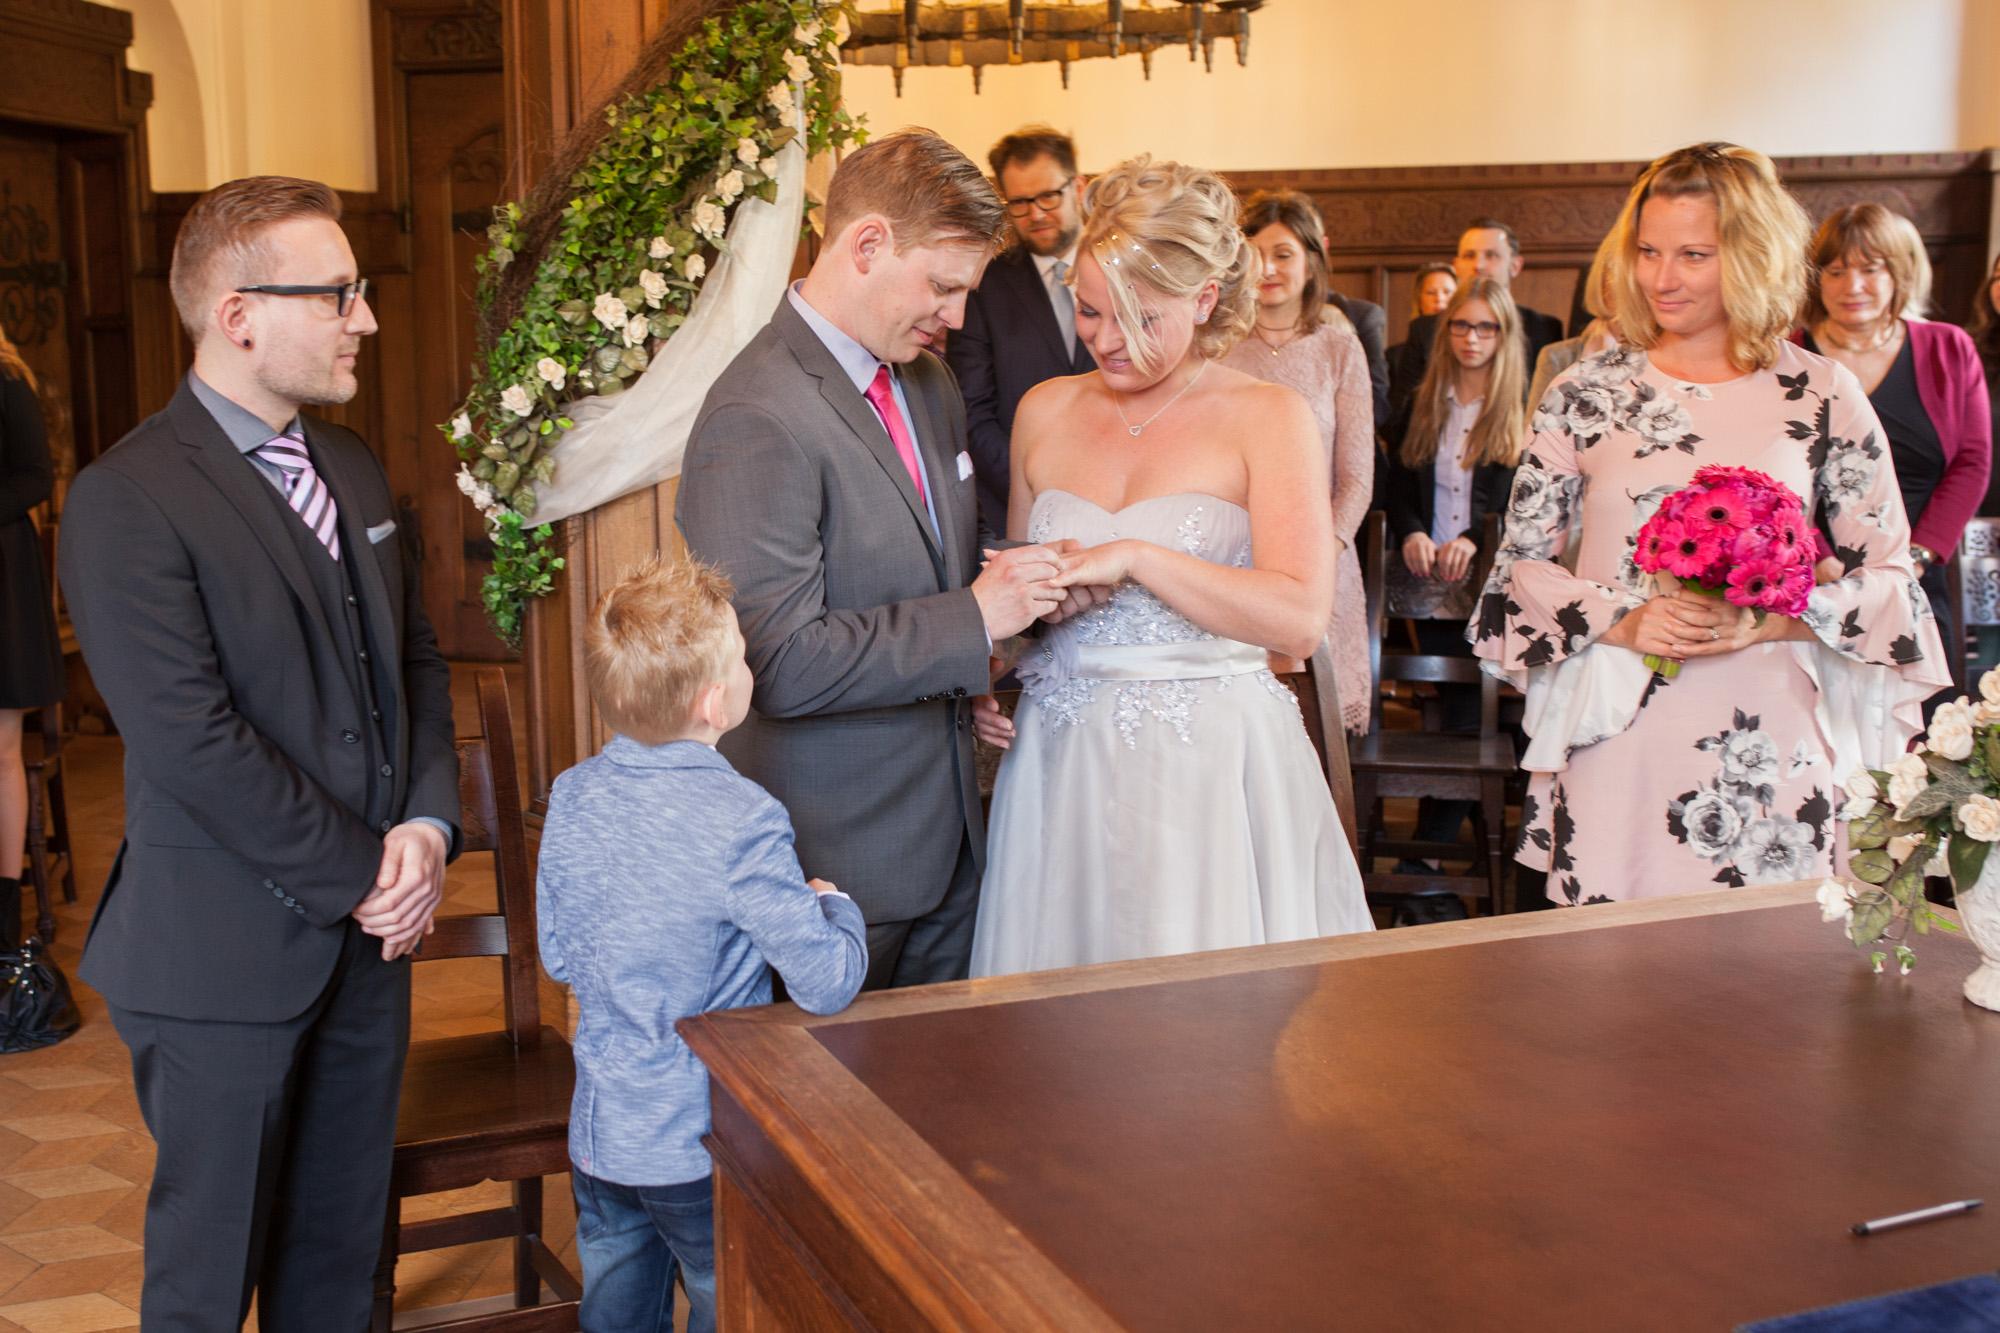 Claudia-Krawinkel-Hochzeitsfotografie-Essen-Duisburg-Standesamt-Schloss-Borbeck-8